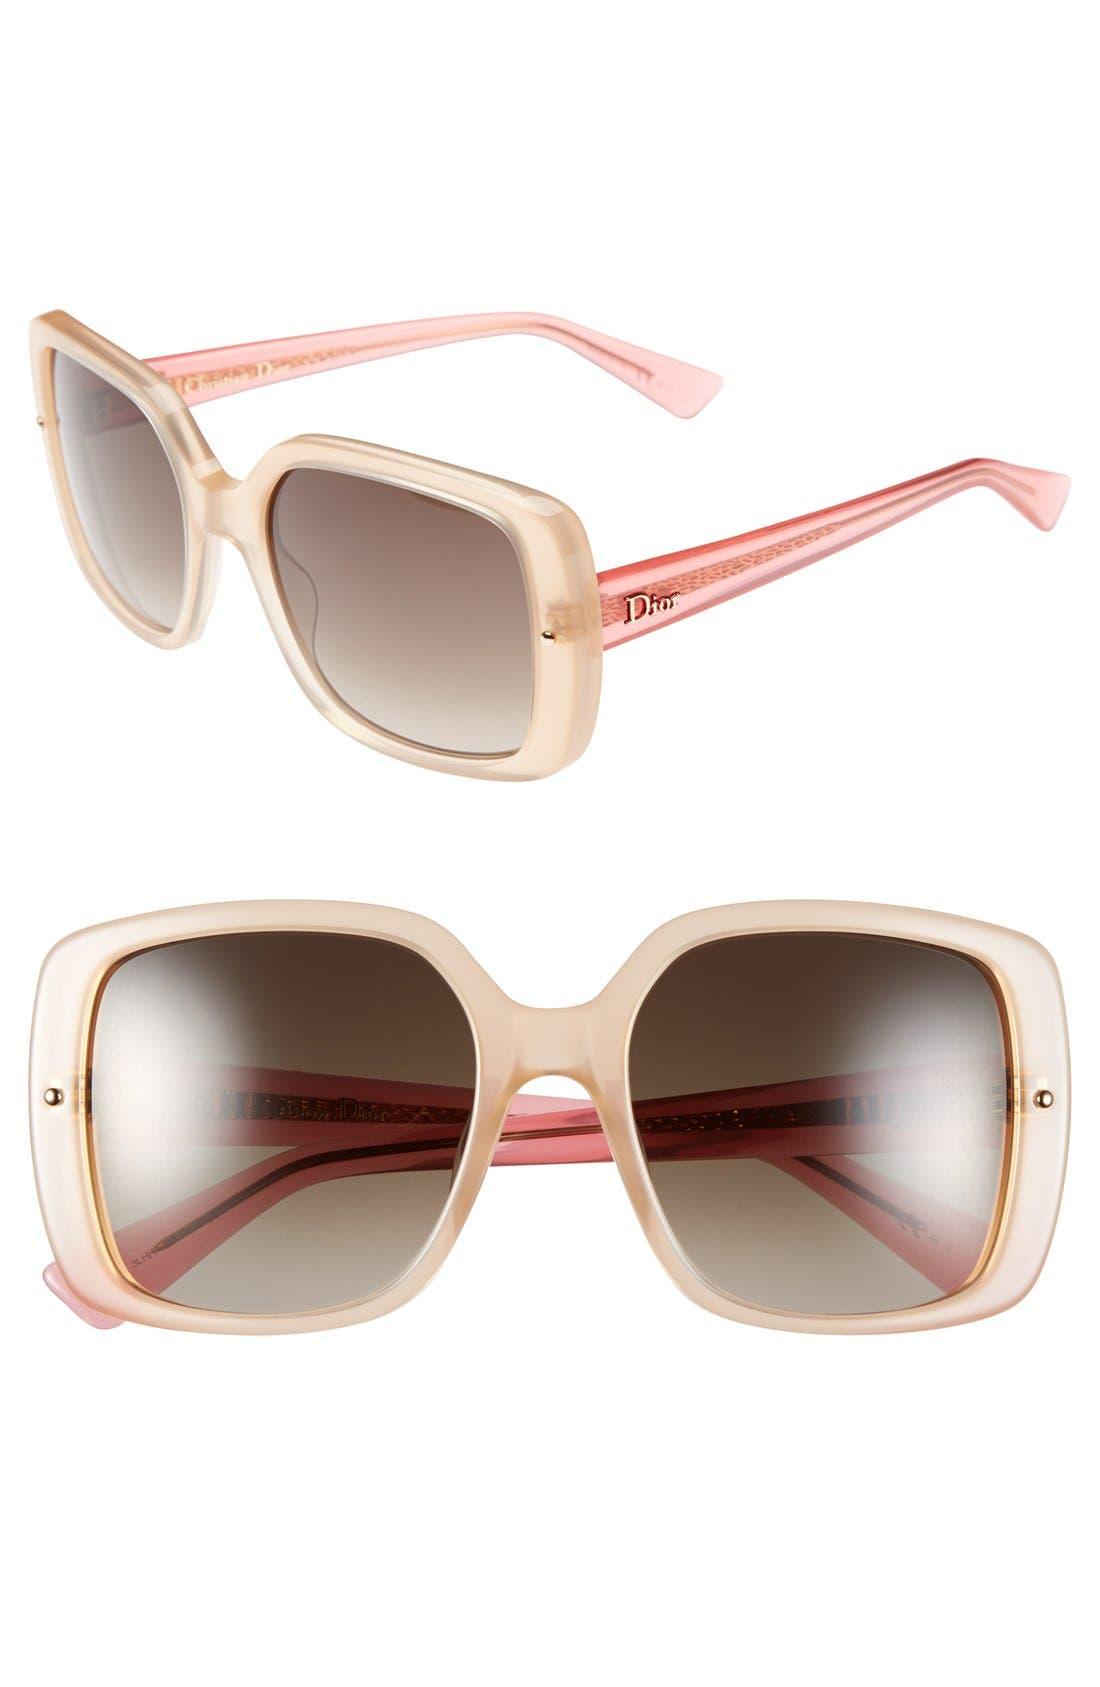 Main Image - Dior 'Jupon' 54mm Sunglasses